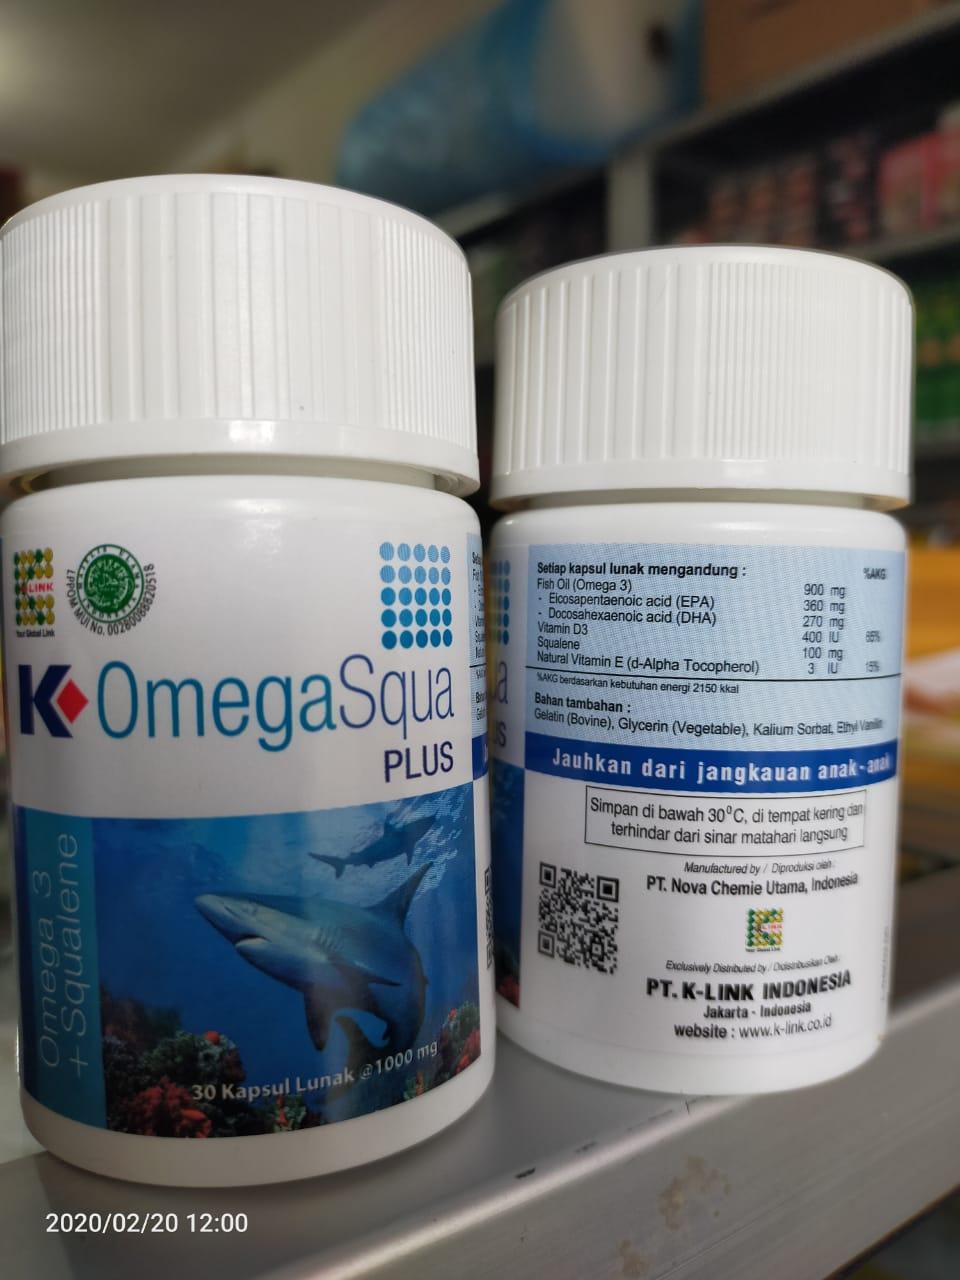 Omega Squa Plus Klink Original Omega K Link Omegasqua 30kpl Lazada Indonesia